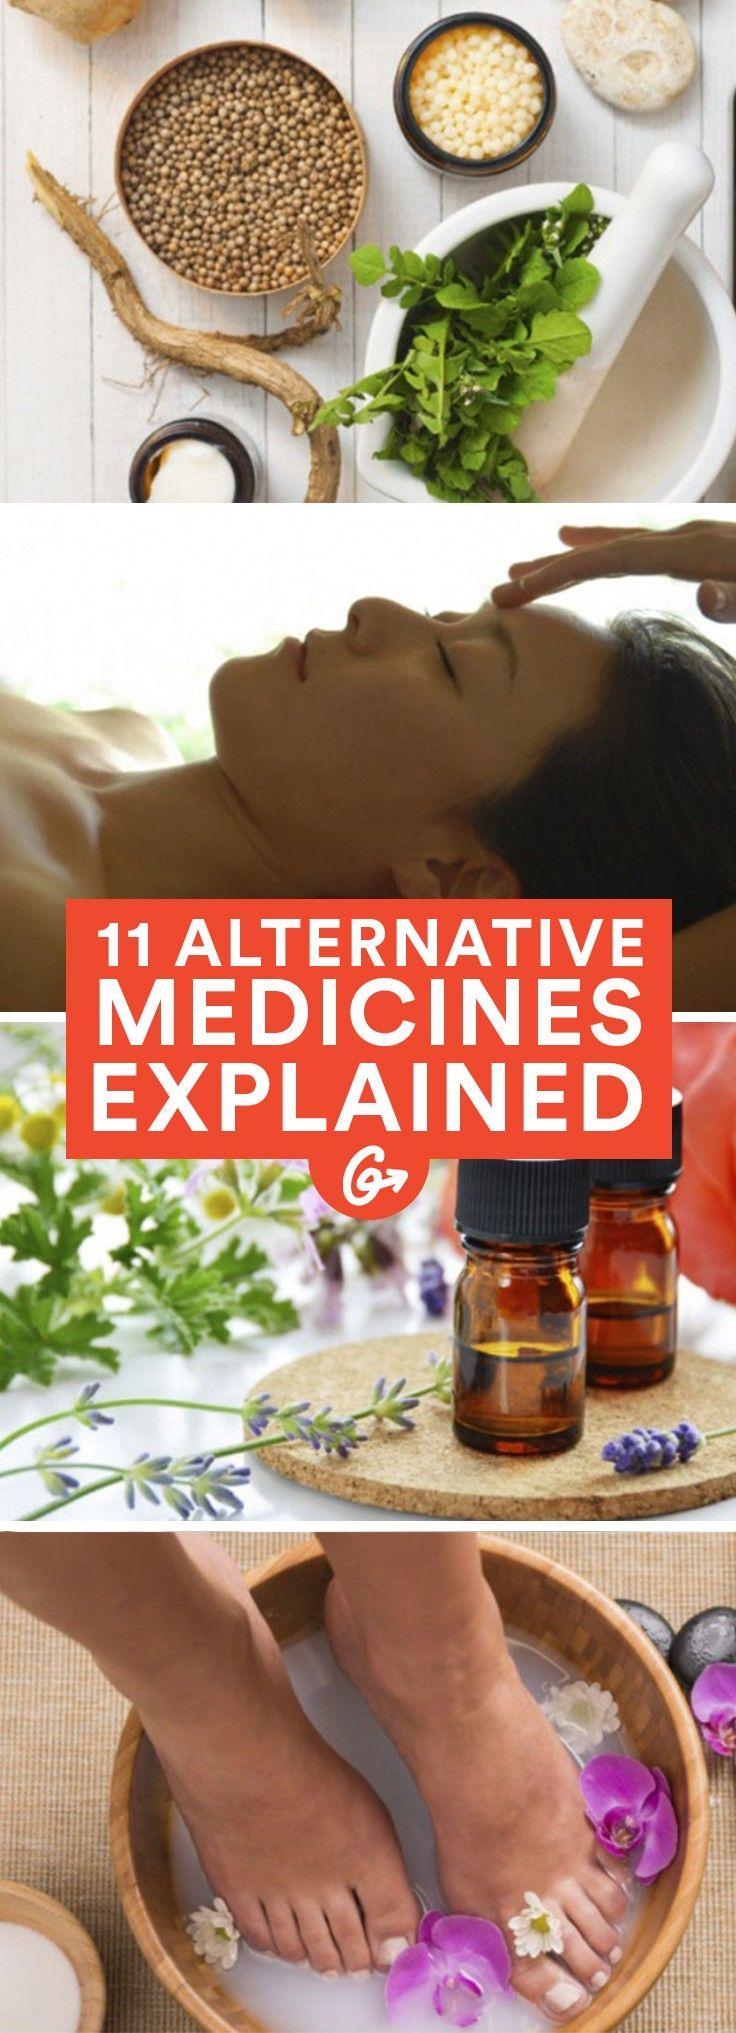 11 Alternative Medicines Explained